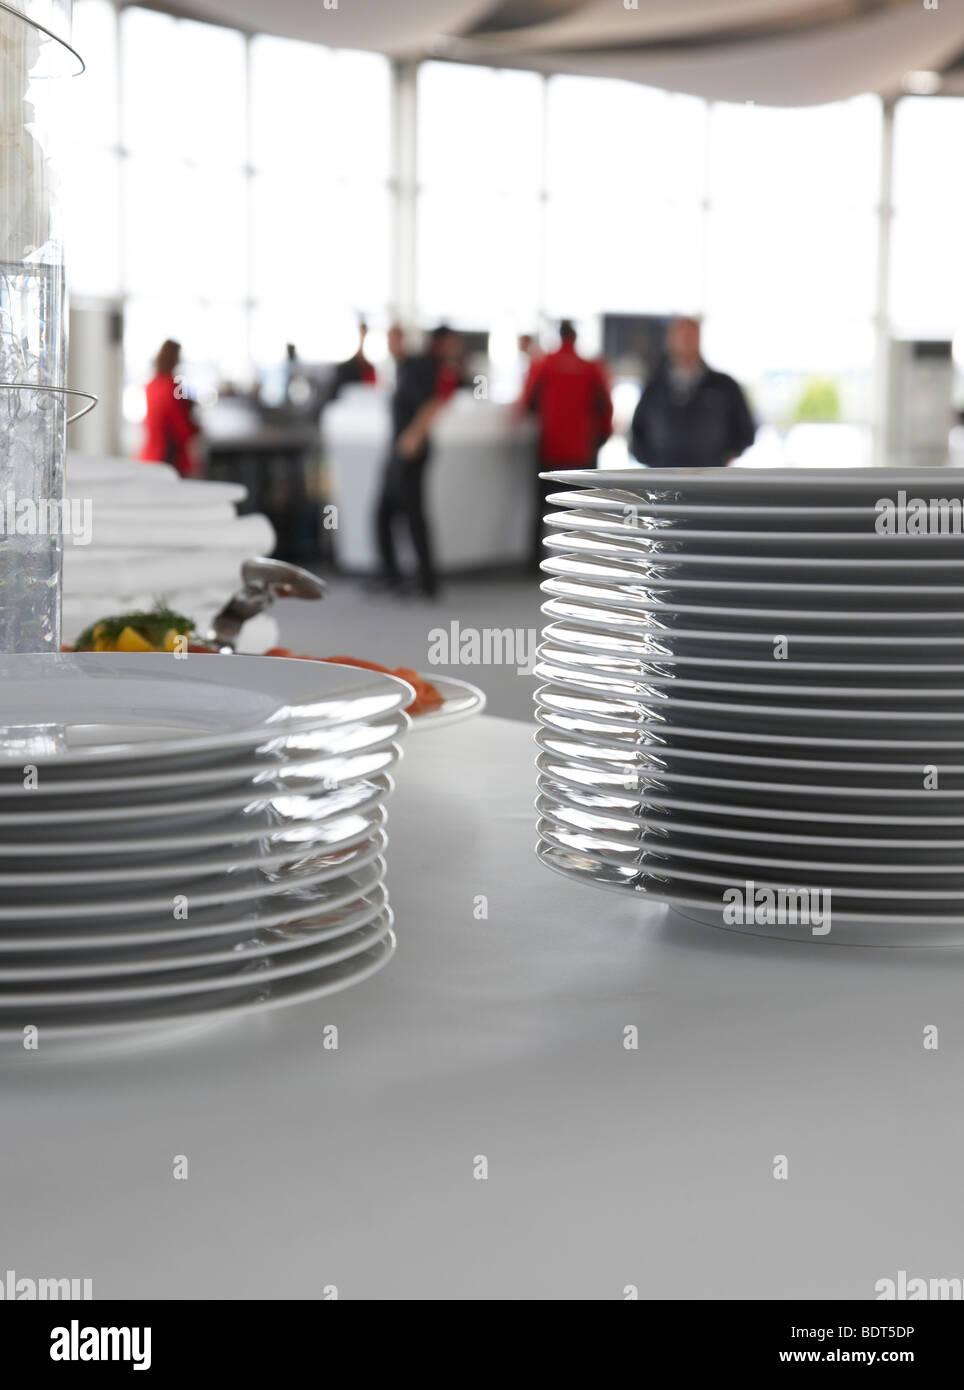 plate stacks - Stock Image